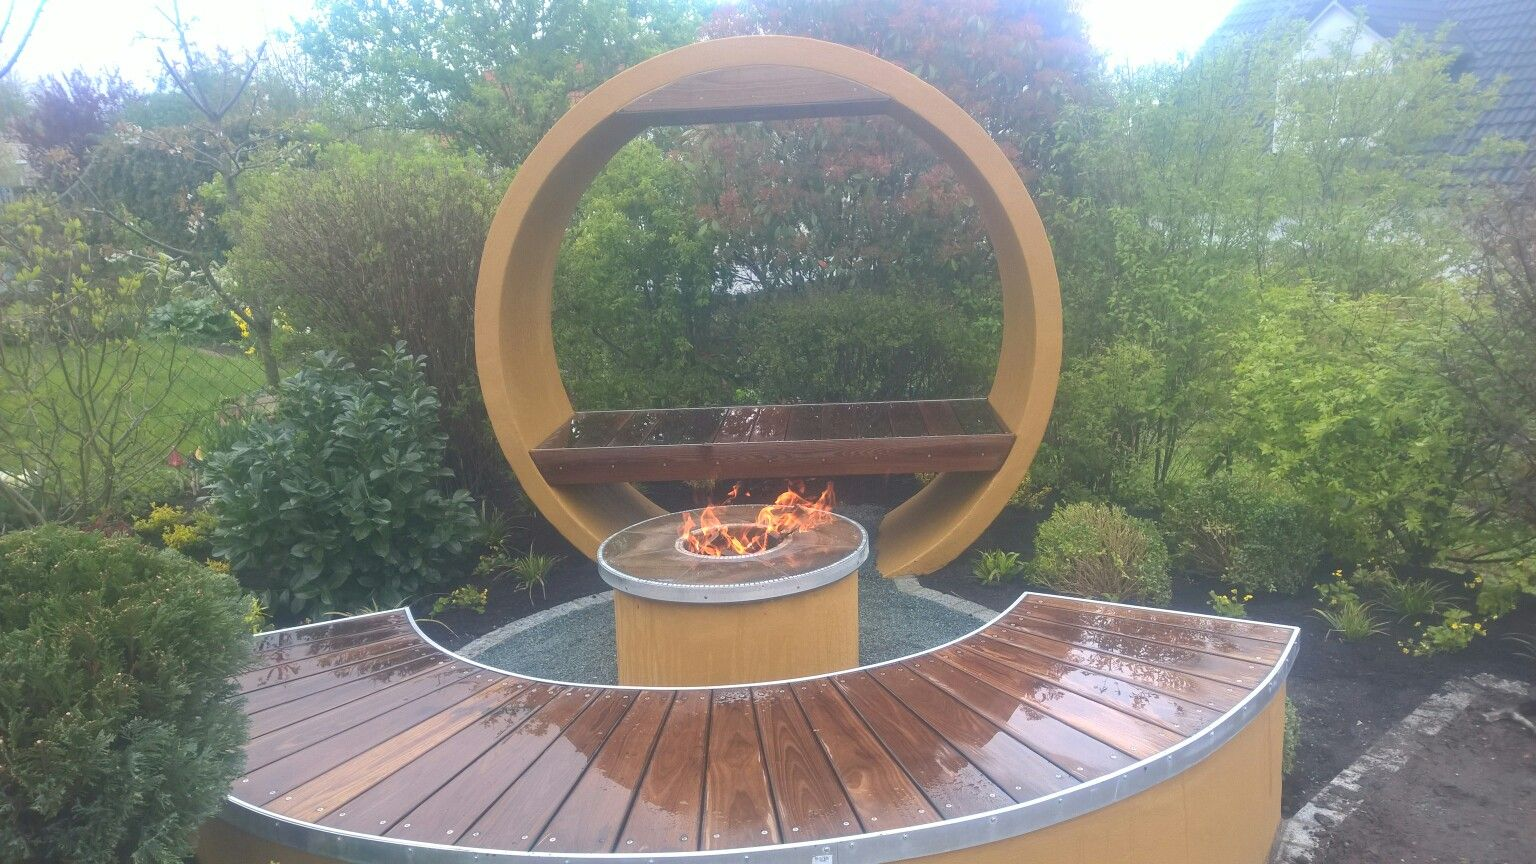 Runde Sitzgruppe, Schachtring, Feuerstelle, Holzbank, Modernes ... Kreative Gartendesigns Rasen